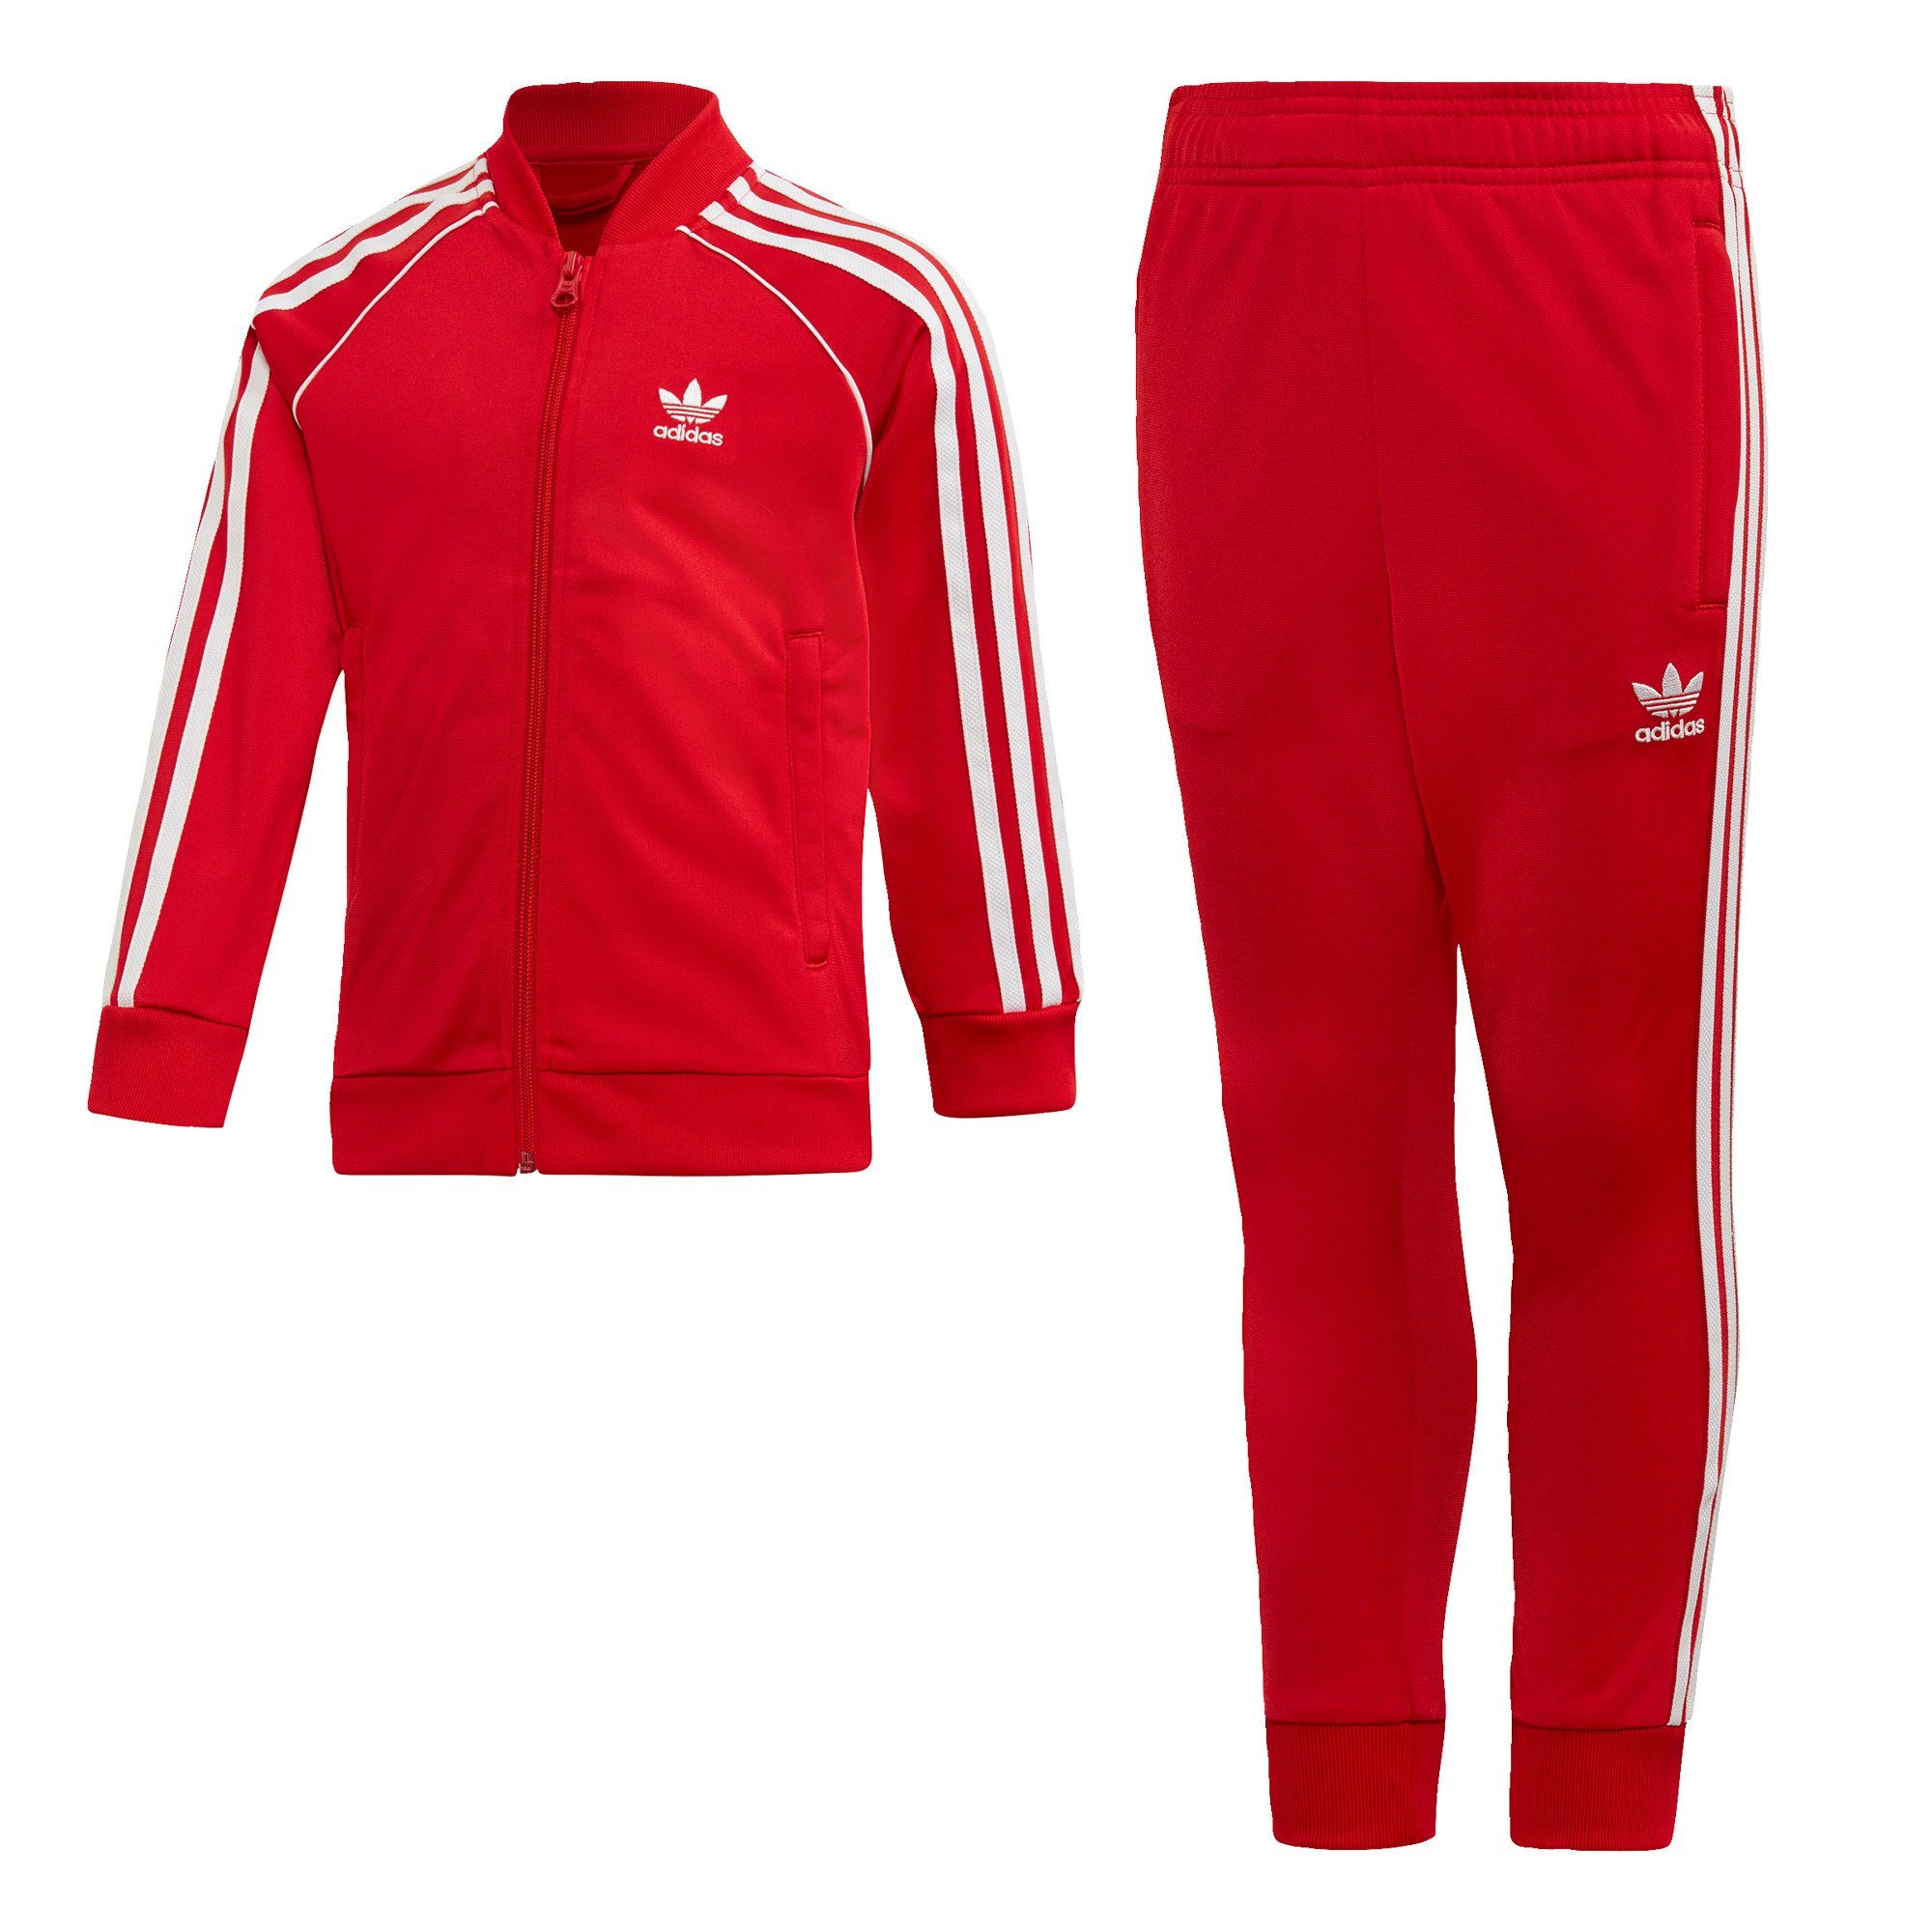 Unisex adidas Originals Trainingsanzug »SST Trainingsanzug«, adicolor    04061622926105